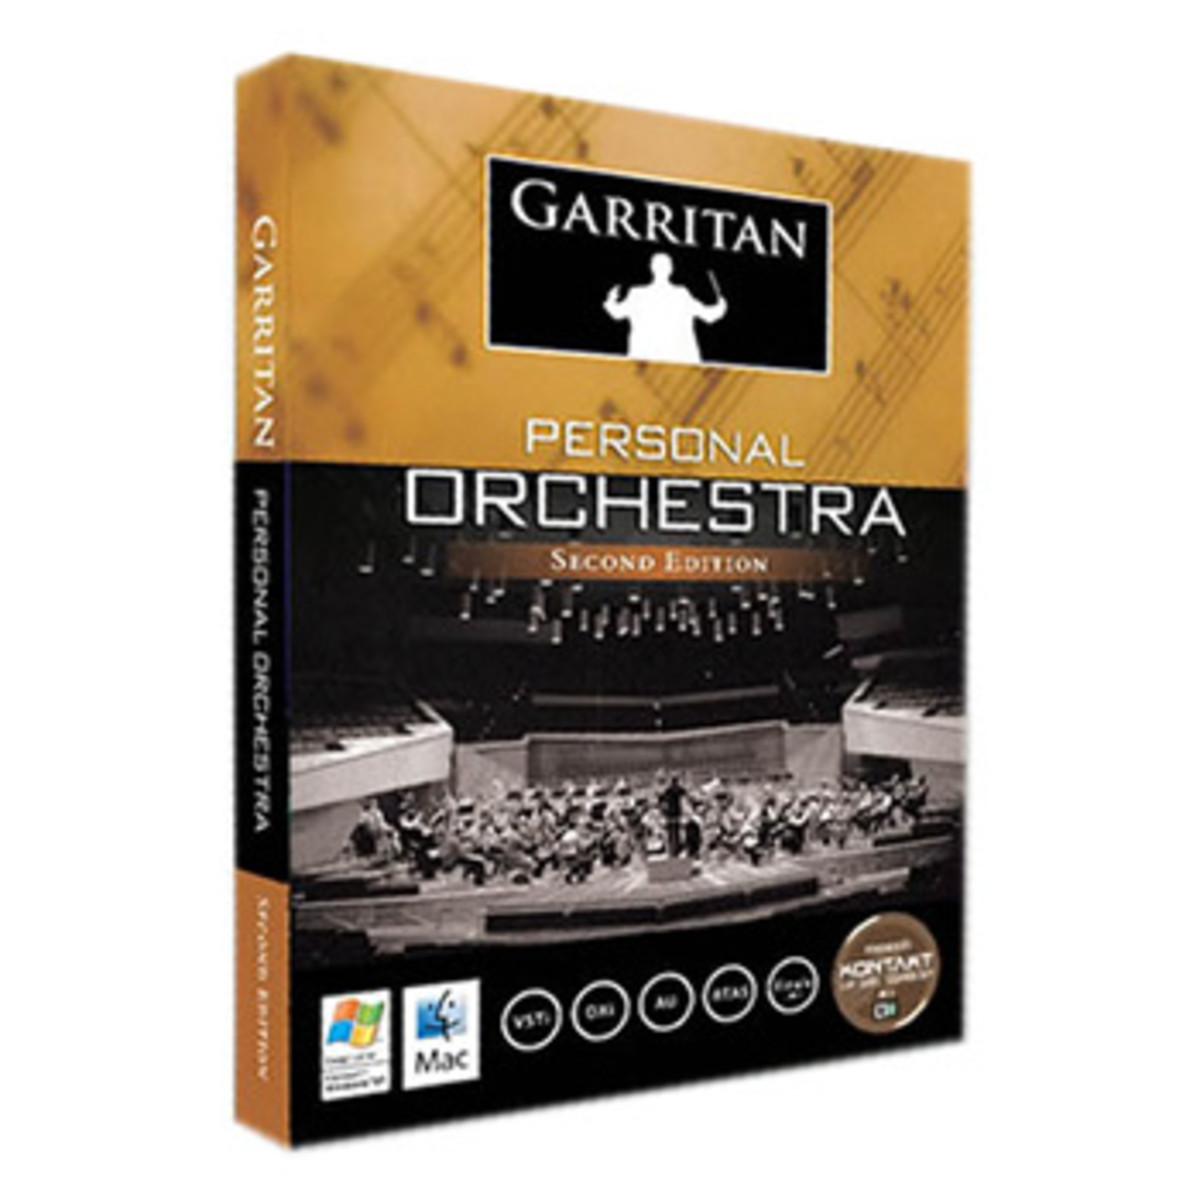 garritan personal orchestra 3rd edition at. Black Bedroom Furniture Sets. Home Design Ideas